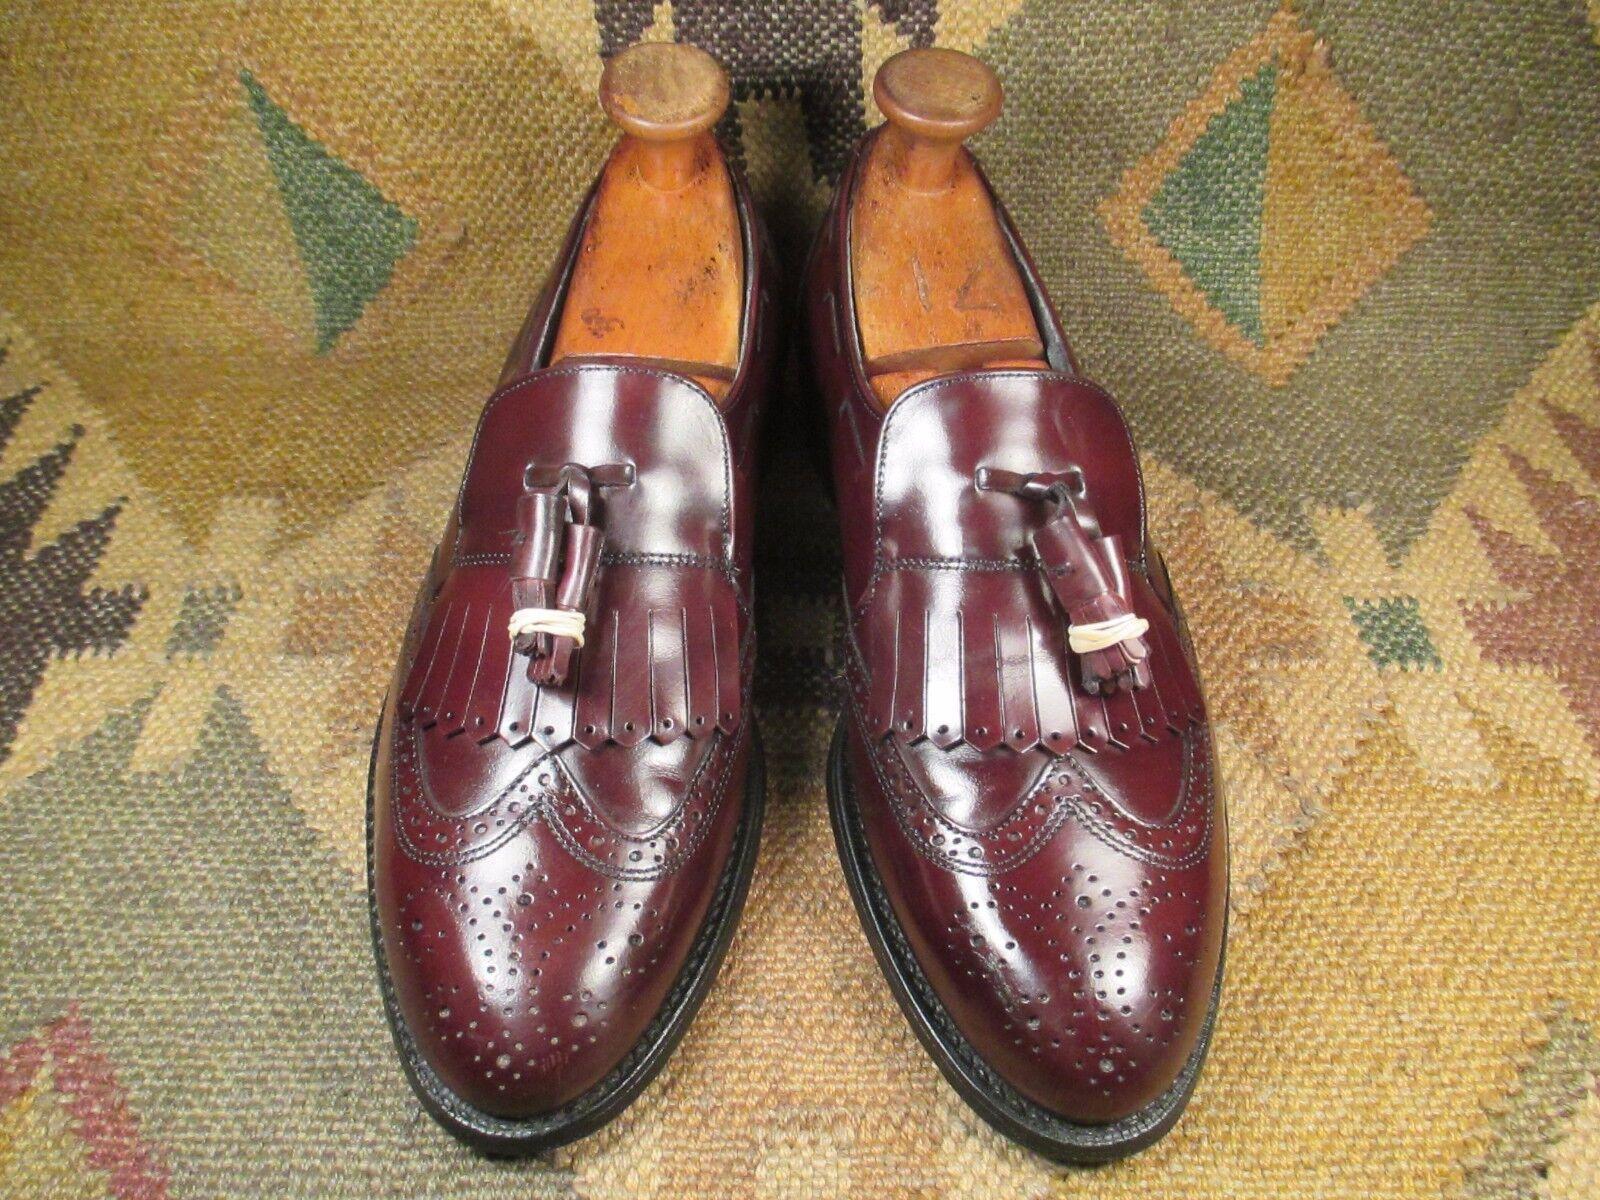 Hanover Cordovan Color Wingtip Tassel  Pelle Loafers Scarpe 8.5 D/B made in USA